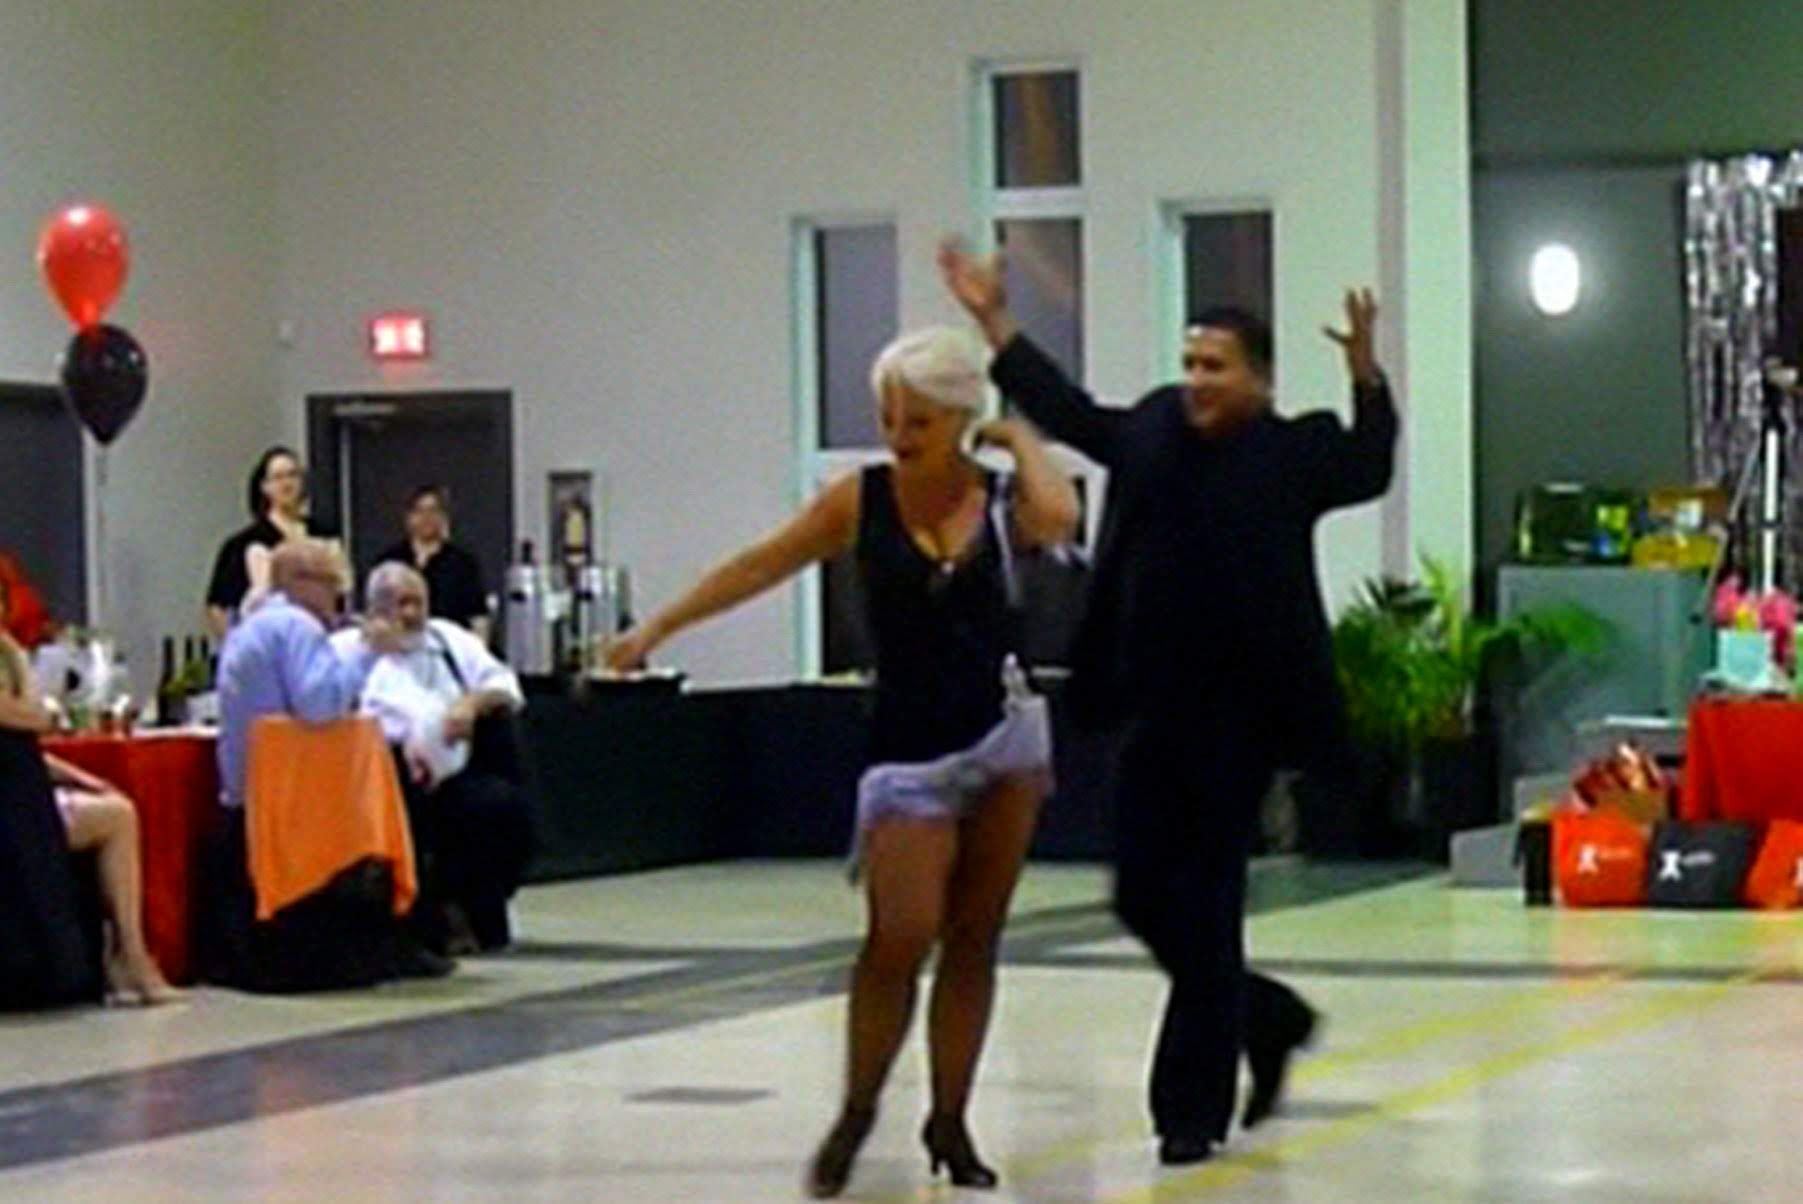 Cours de Danse Salsa Brossard Montreal Rive Sud Bachata Nouv Session